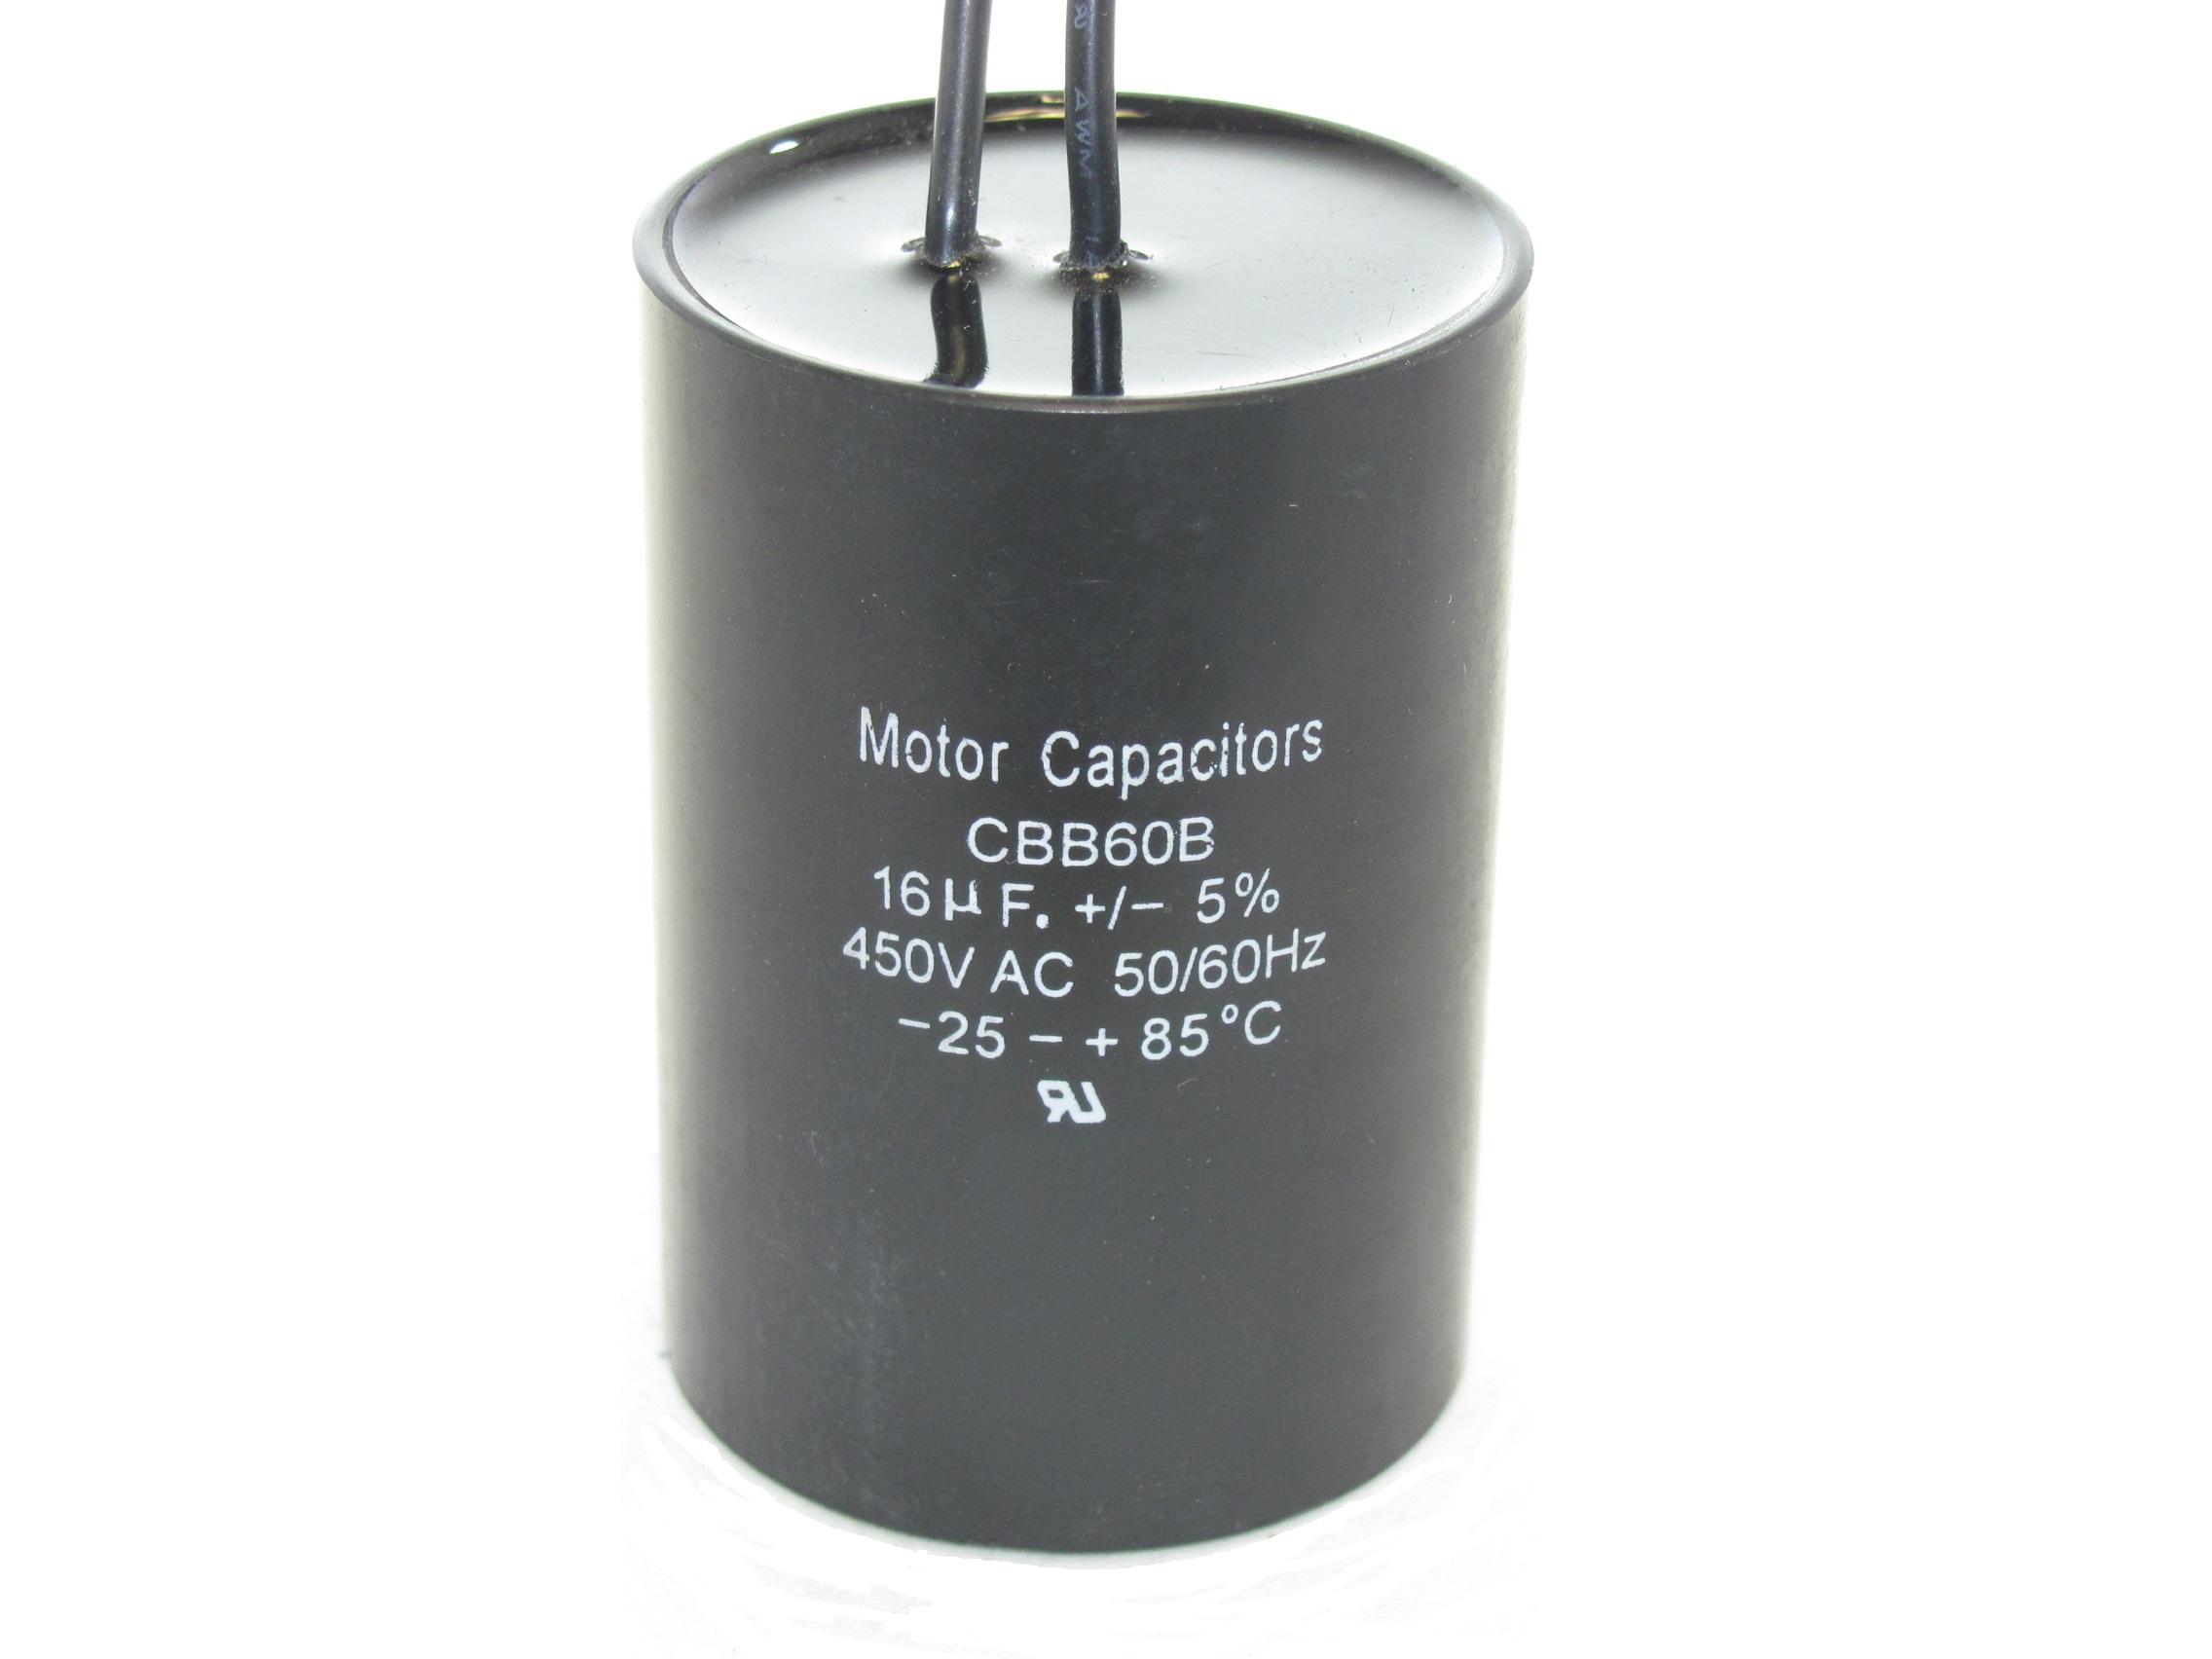 Cbb60b 450n166 16 Uf 450 Vac Capacitor Capacitor Industries